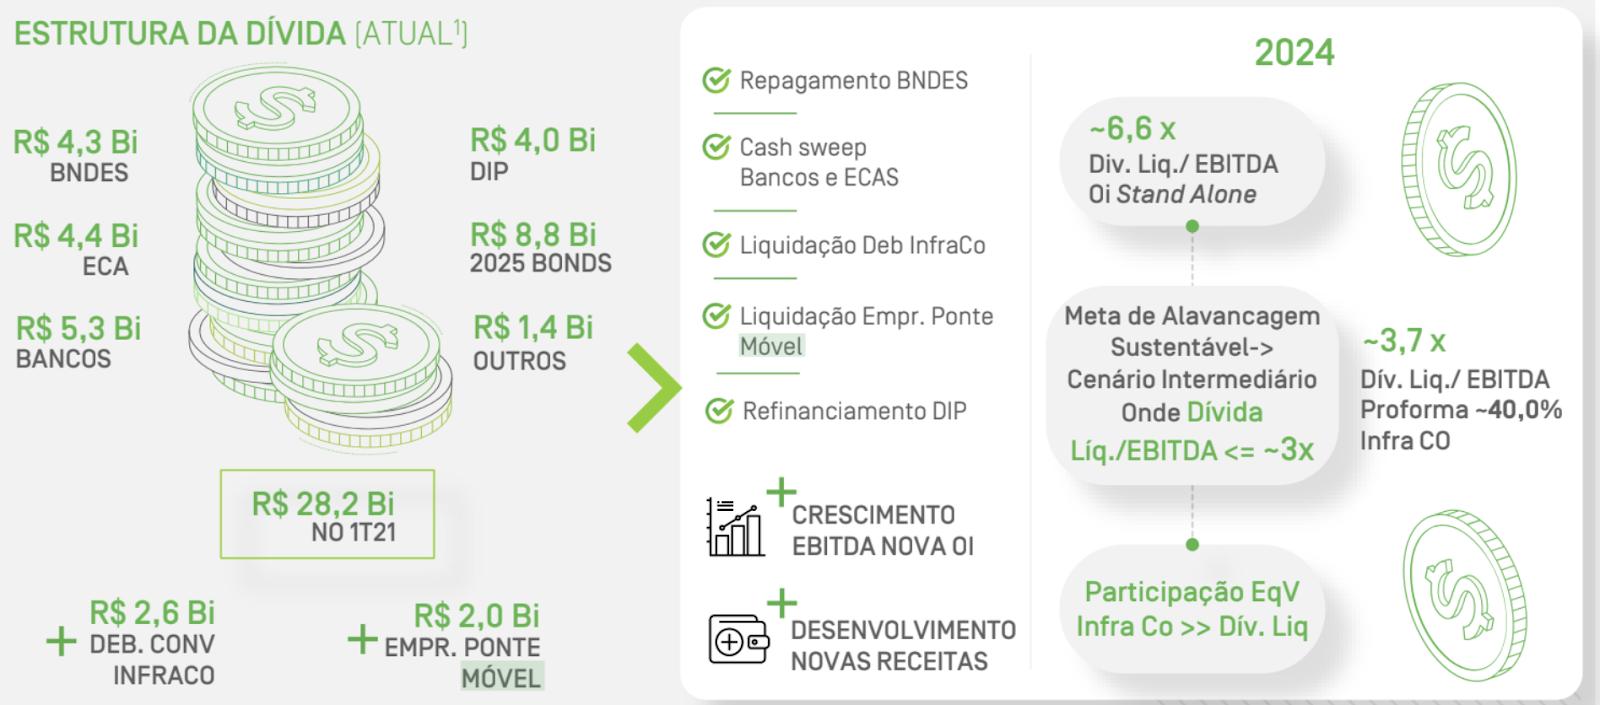 Estrutura atual e projetada para o endividamento da Oi.